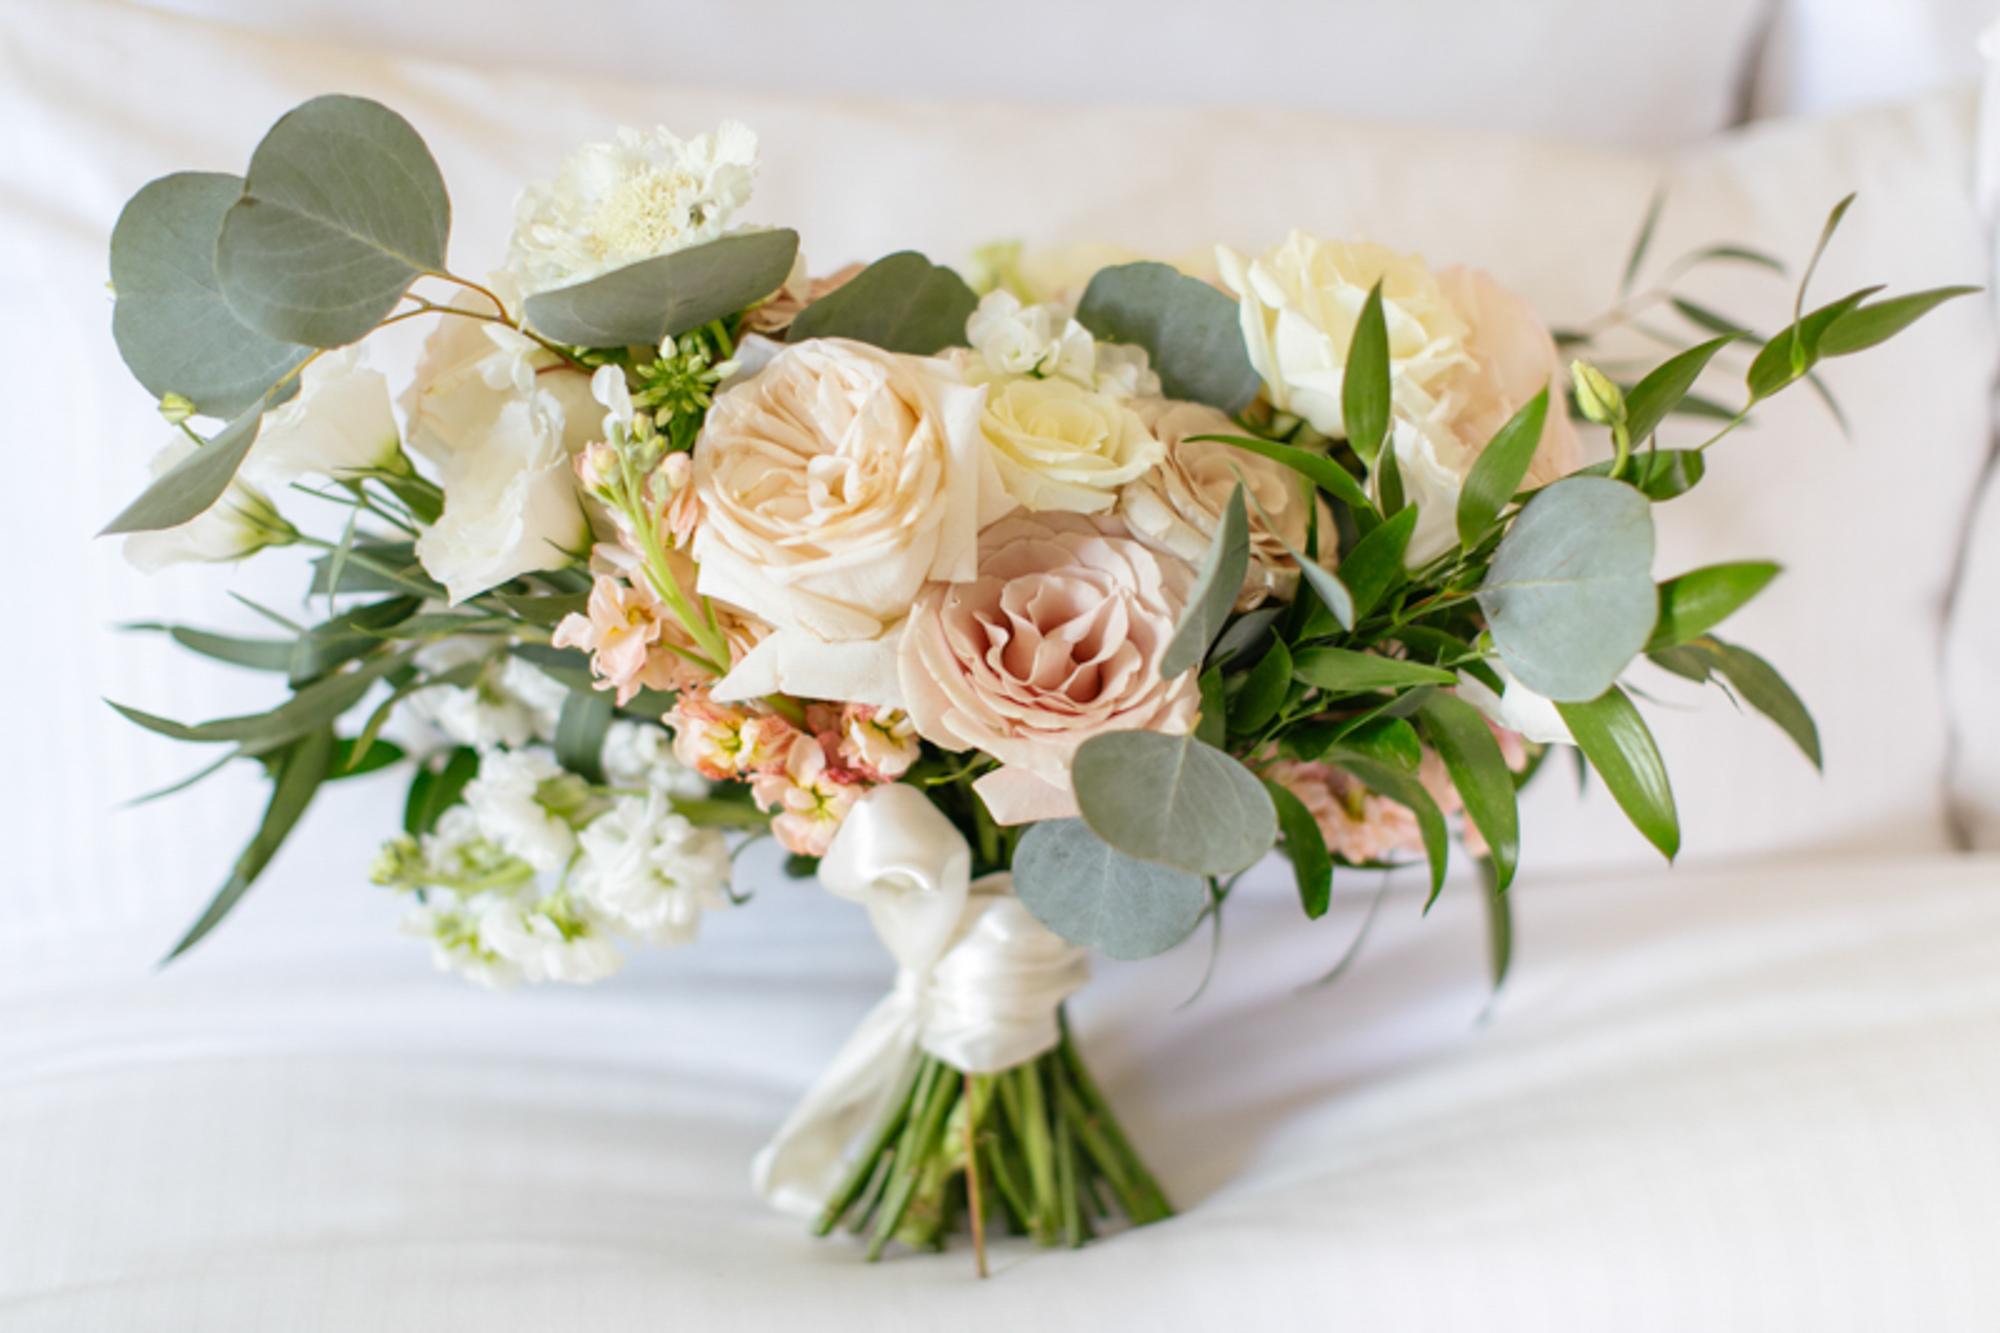 vancouver-luxury-wedding-photographer-lori-miles--16.jpg